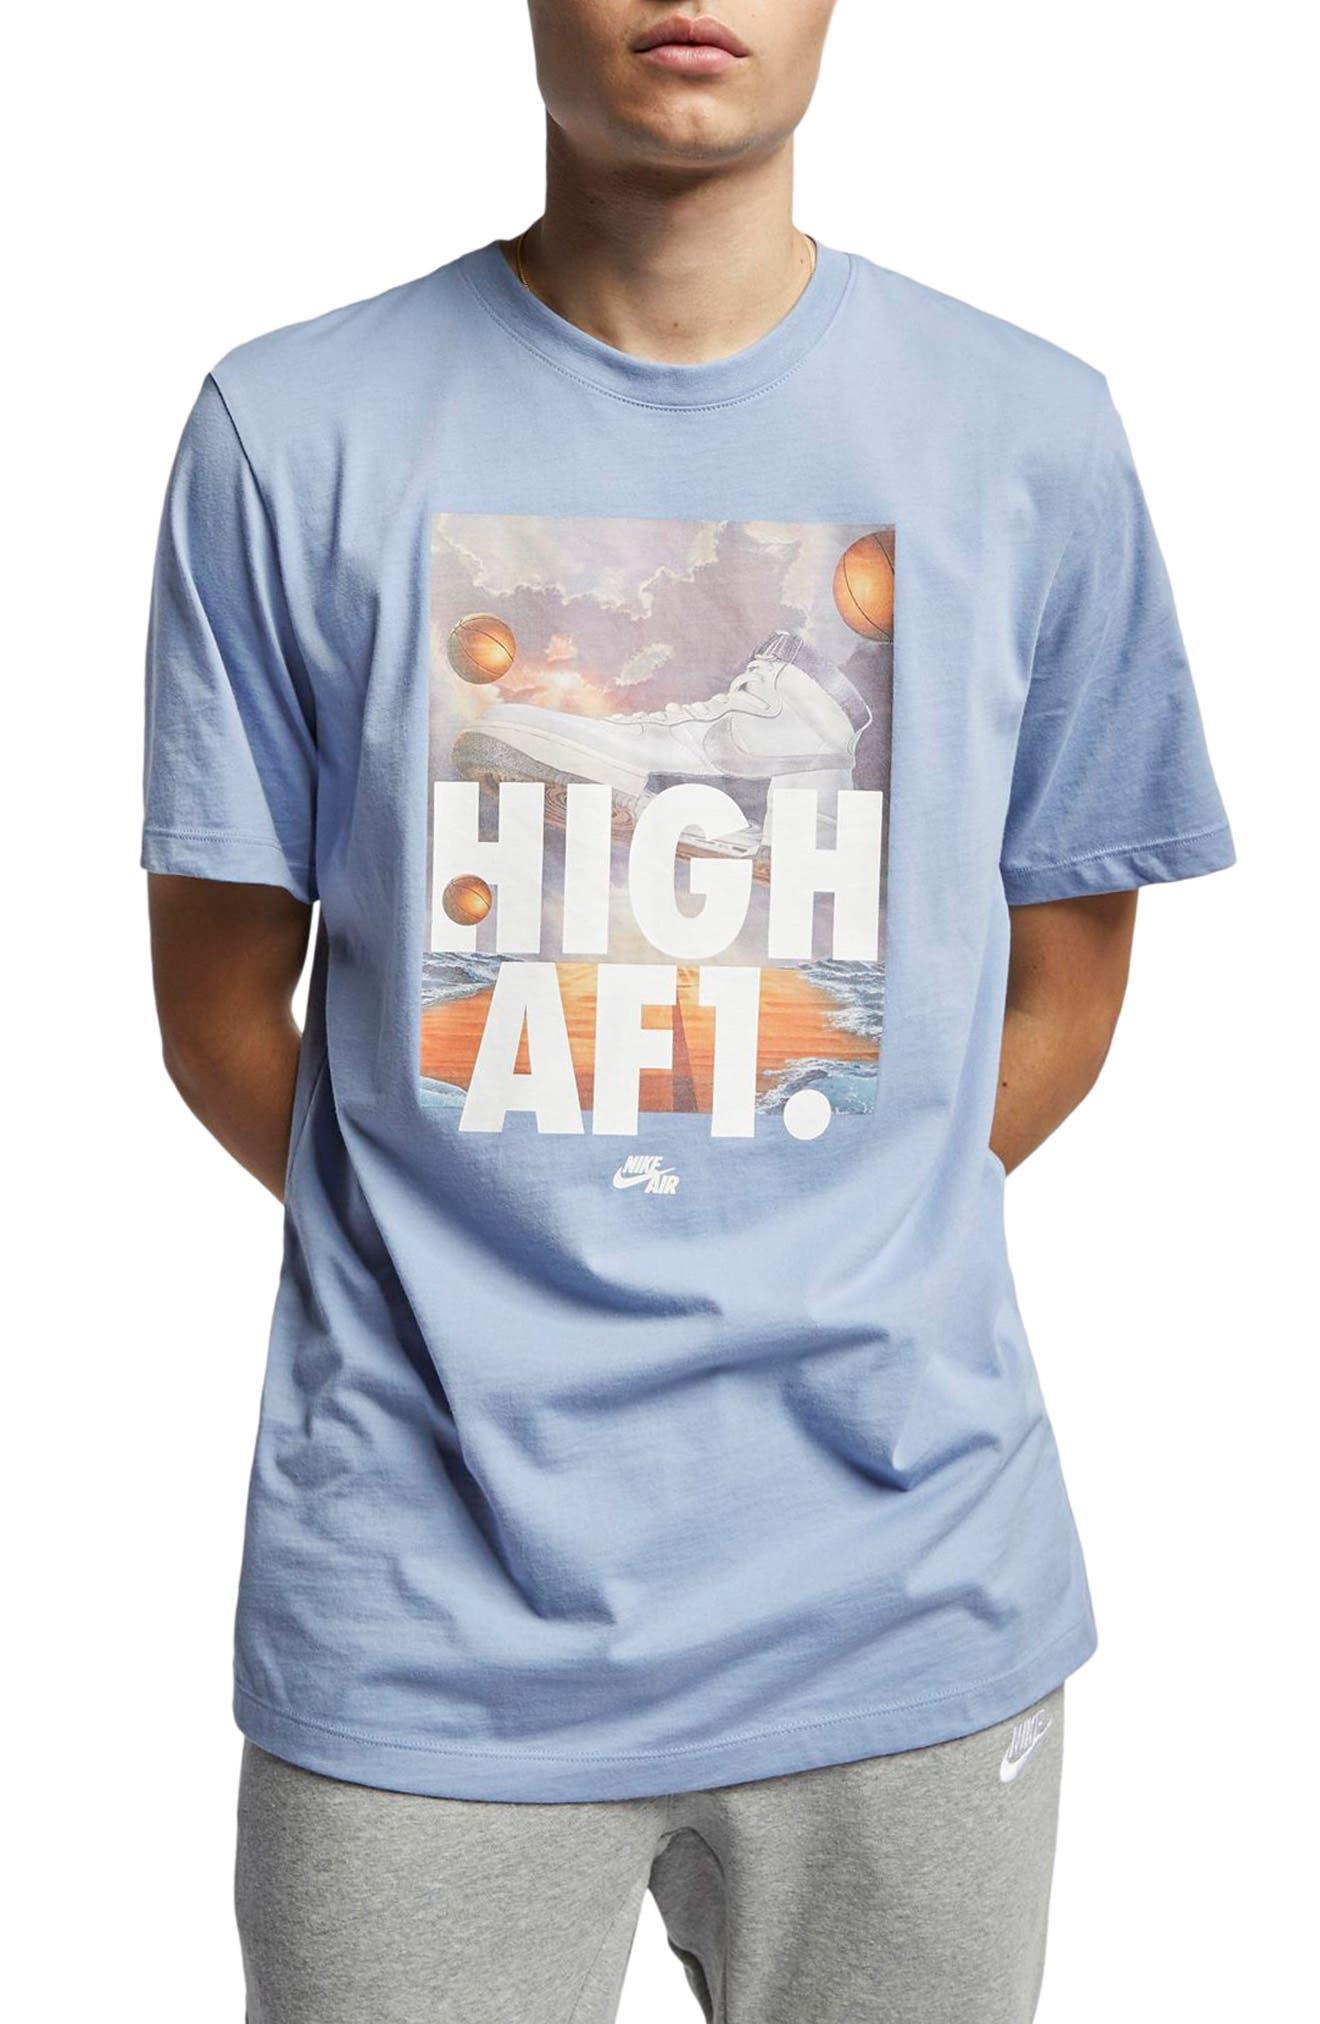 3f24b972ab8 Nike Air Force 1 T-Shirt Blue